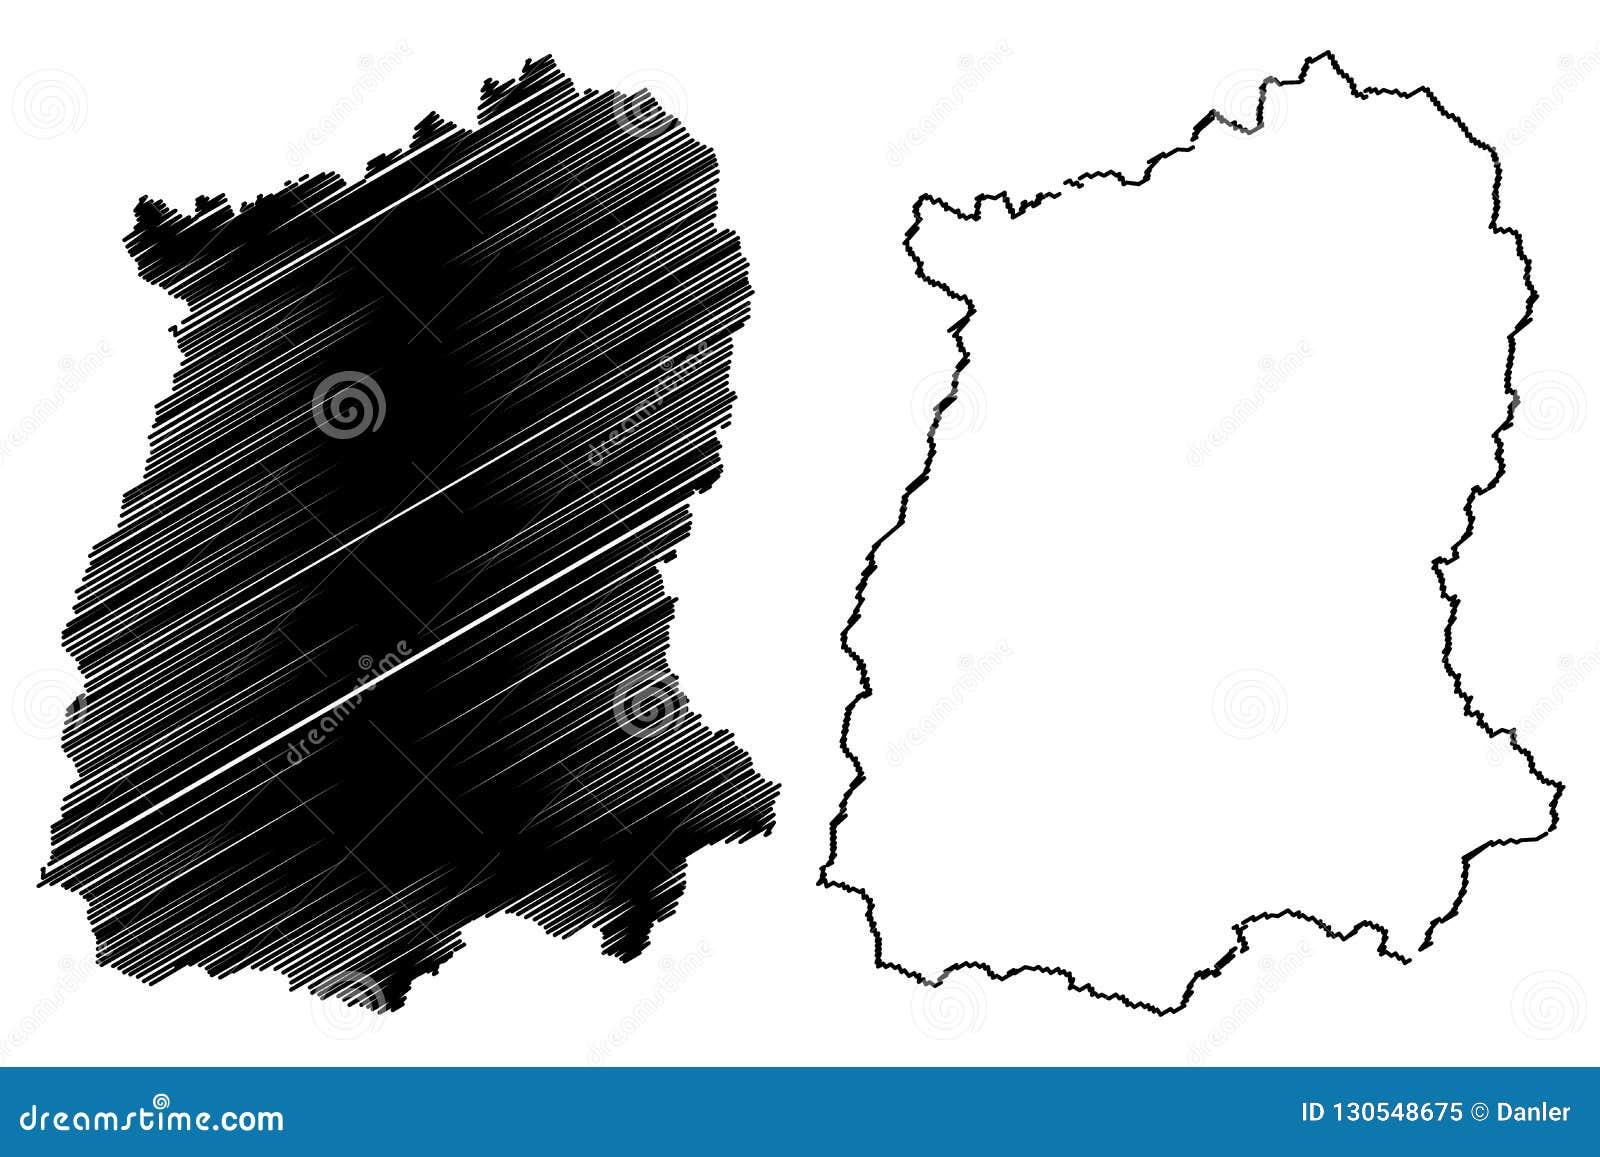 Carte Inde Sikkim.Vecteur De Carte Du Sikkim Illustration De Vecteur Illustration Du